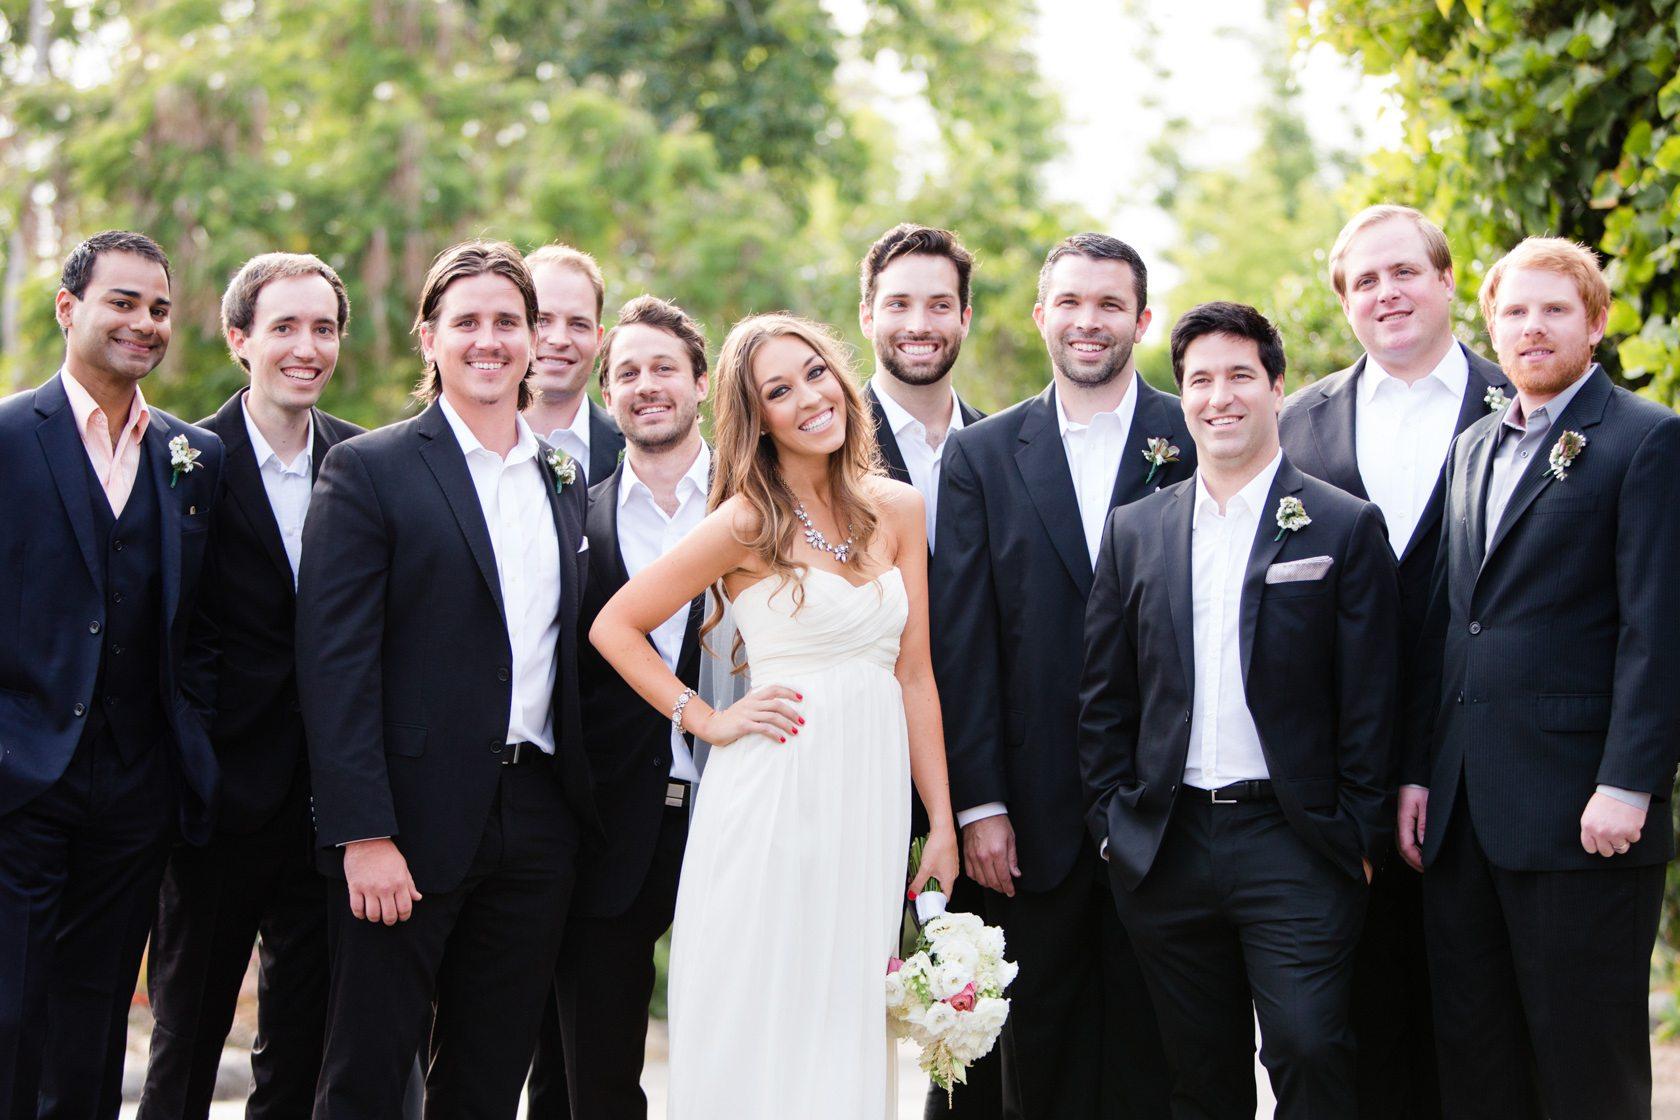 San_Diego_Botanic_Gardens_Wedding_054.jpg